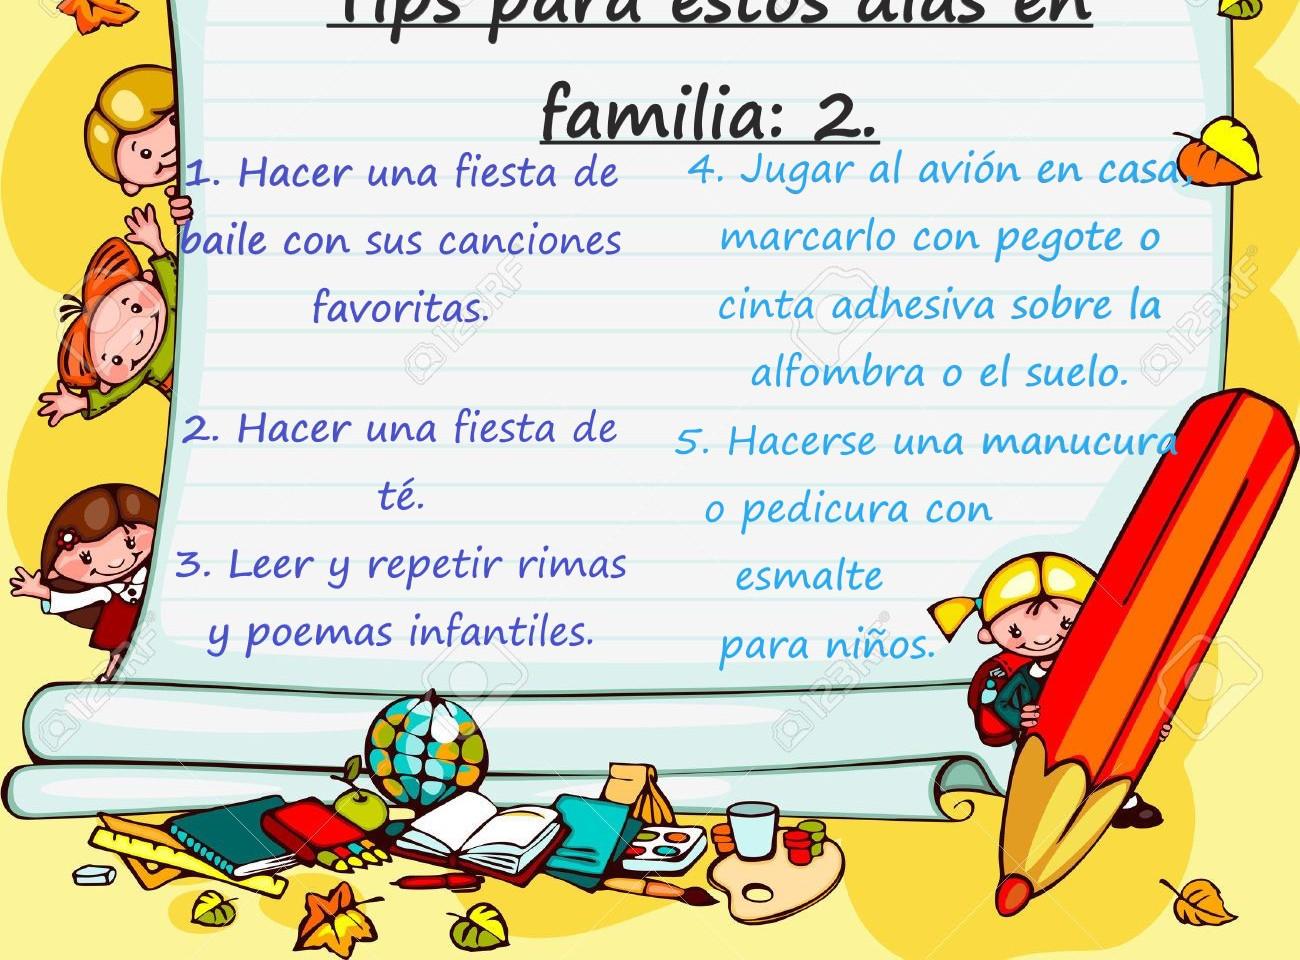 Tips para estos días en familia 2